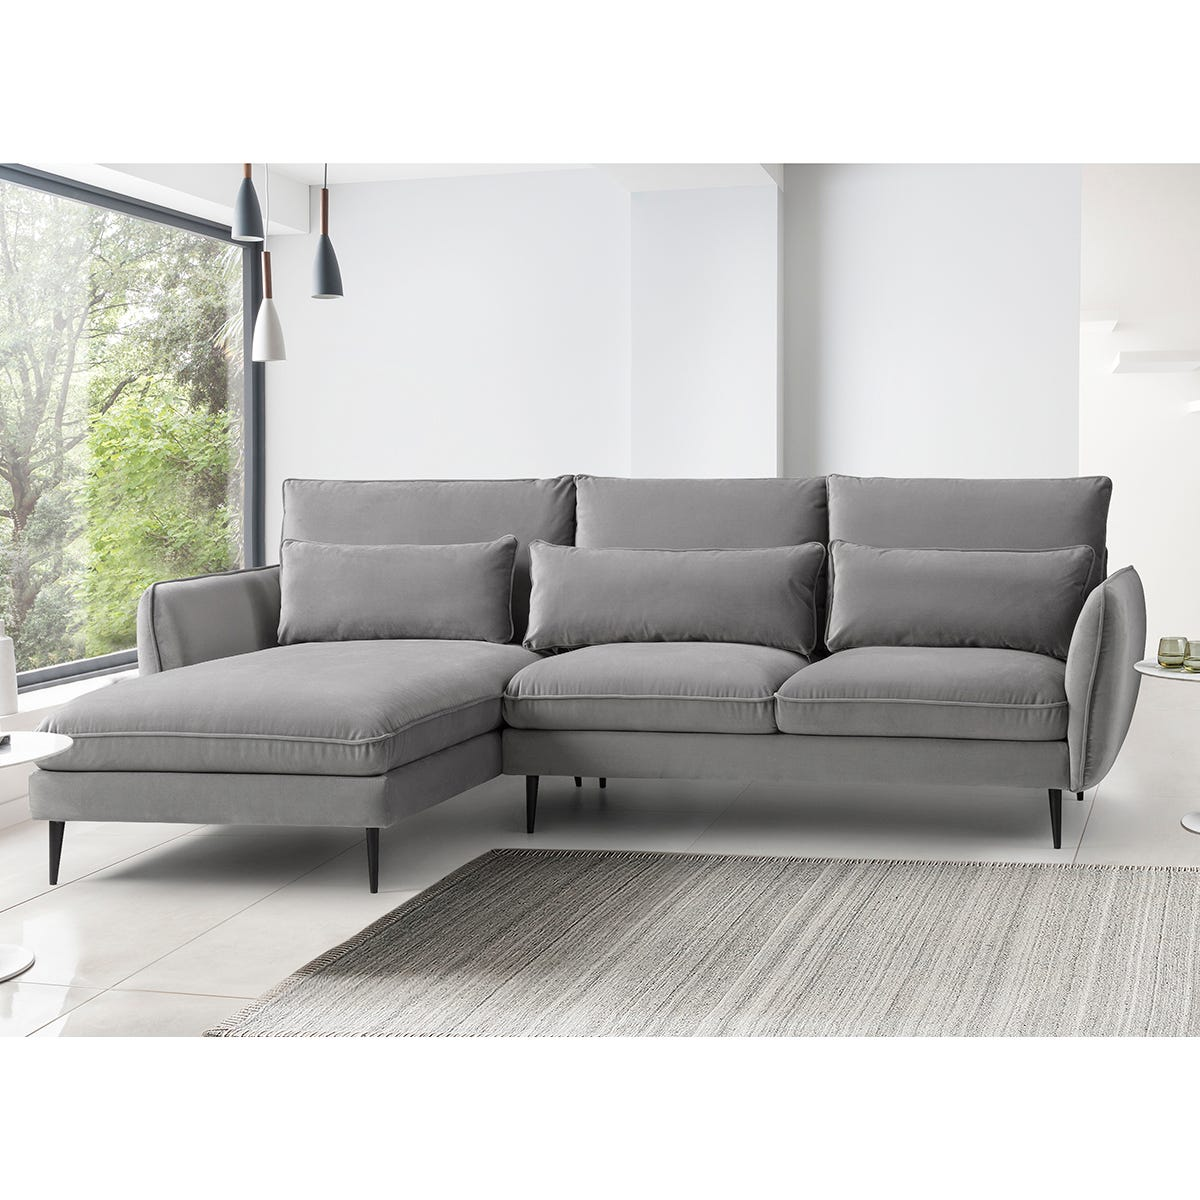 Rhonda Corner Chaise Sofa - Malta Grey